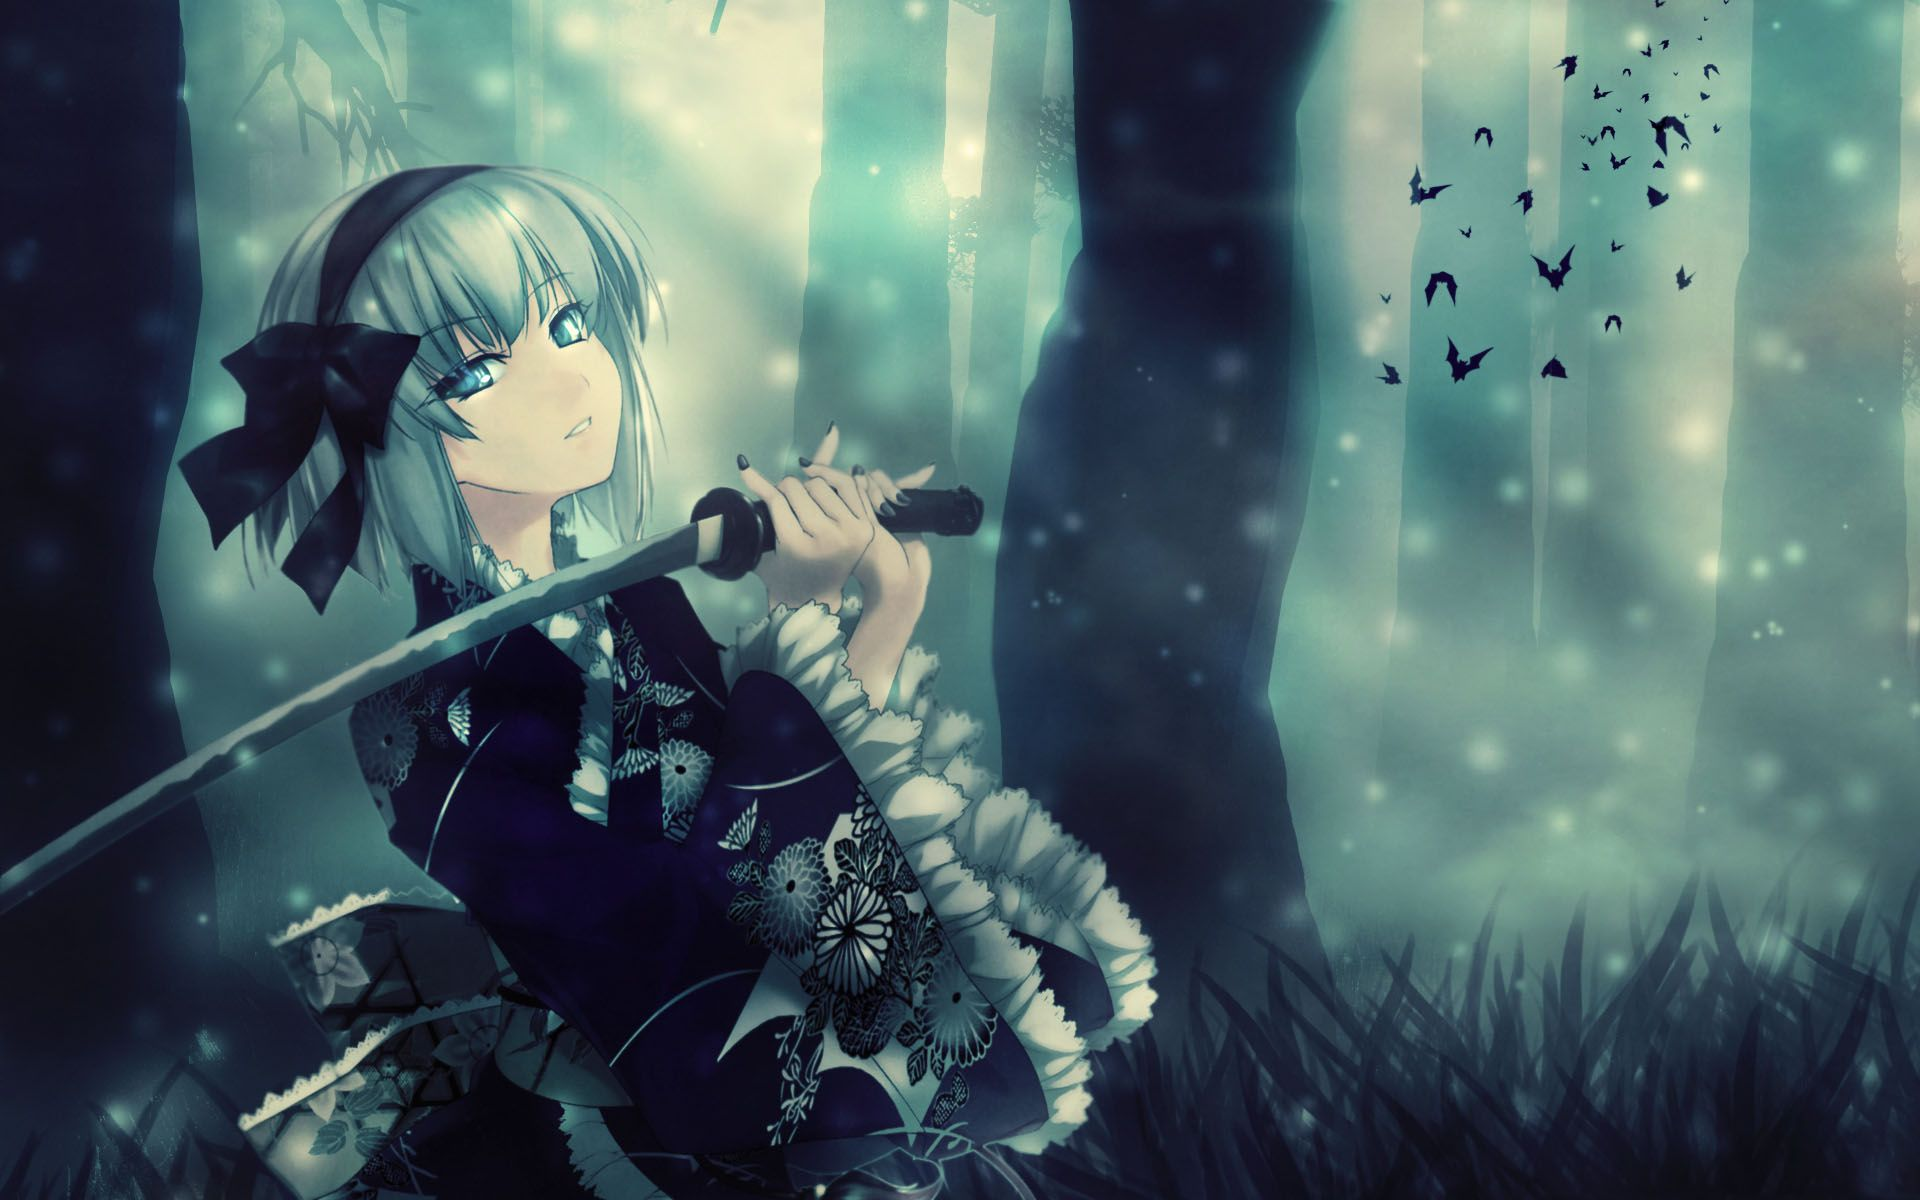 Download Anime Best Amazing Top Wallpaper 1600x1200   Full HD ...